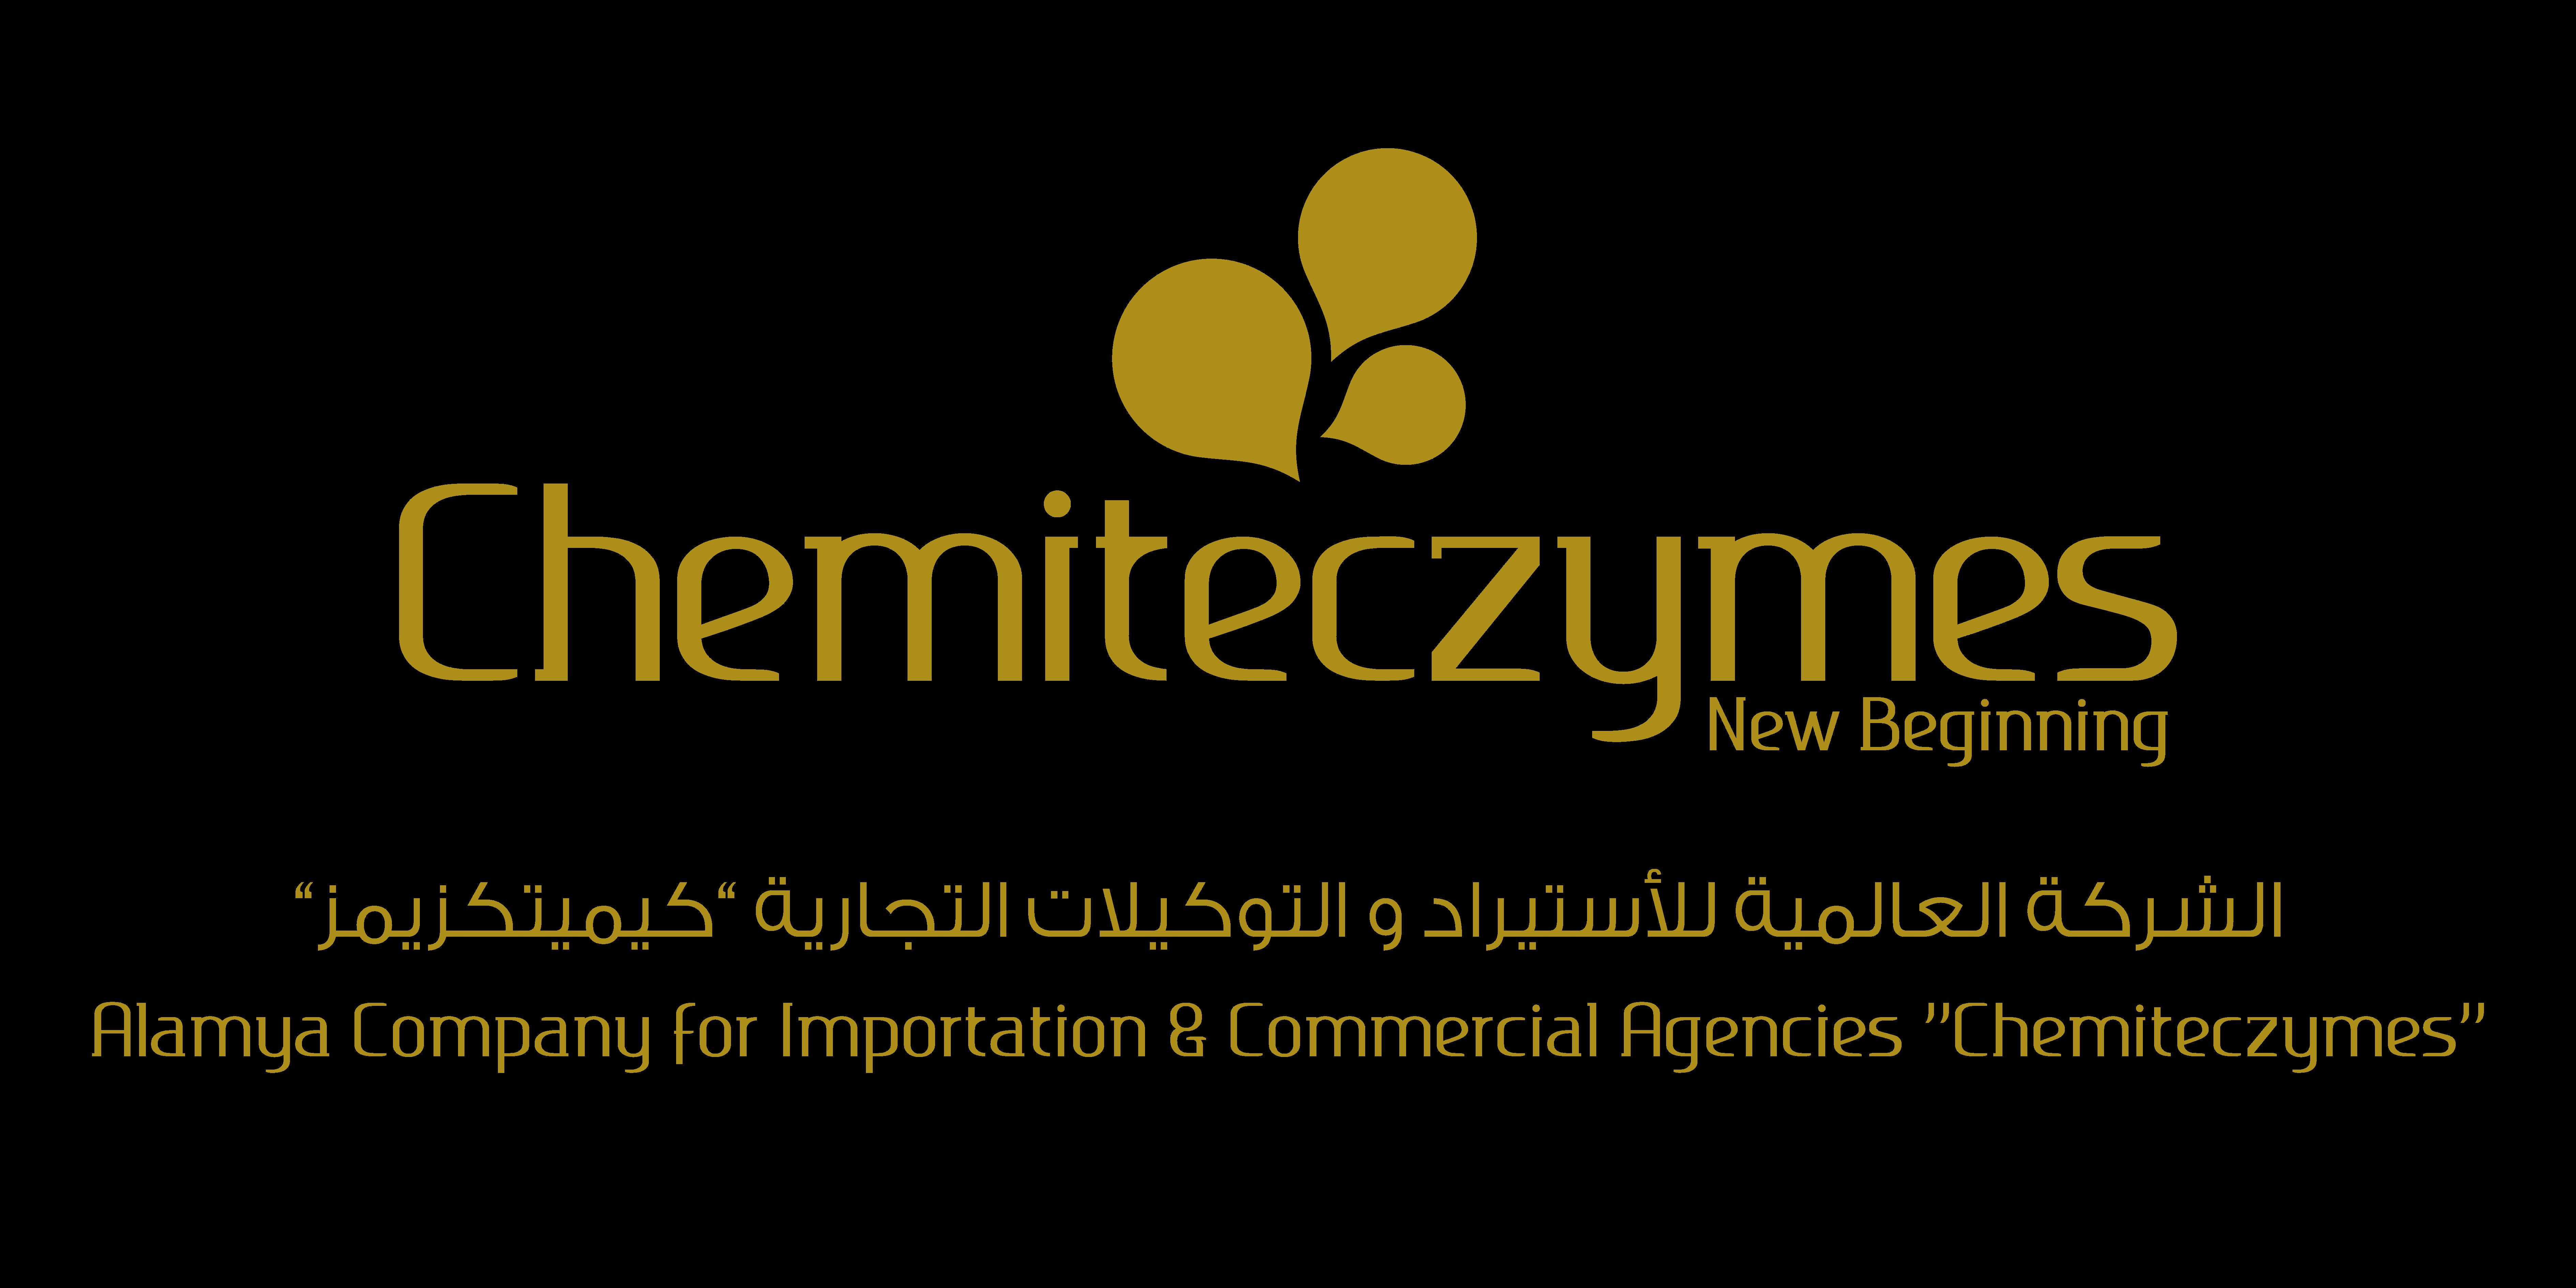 Alamya company for Importation & Commercial Agencies - Chemiteczymes